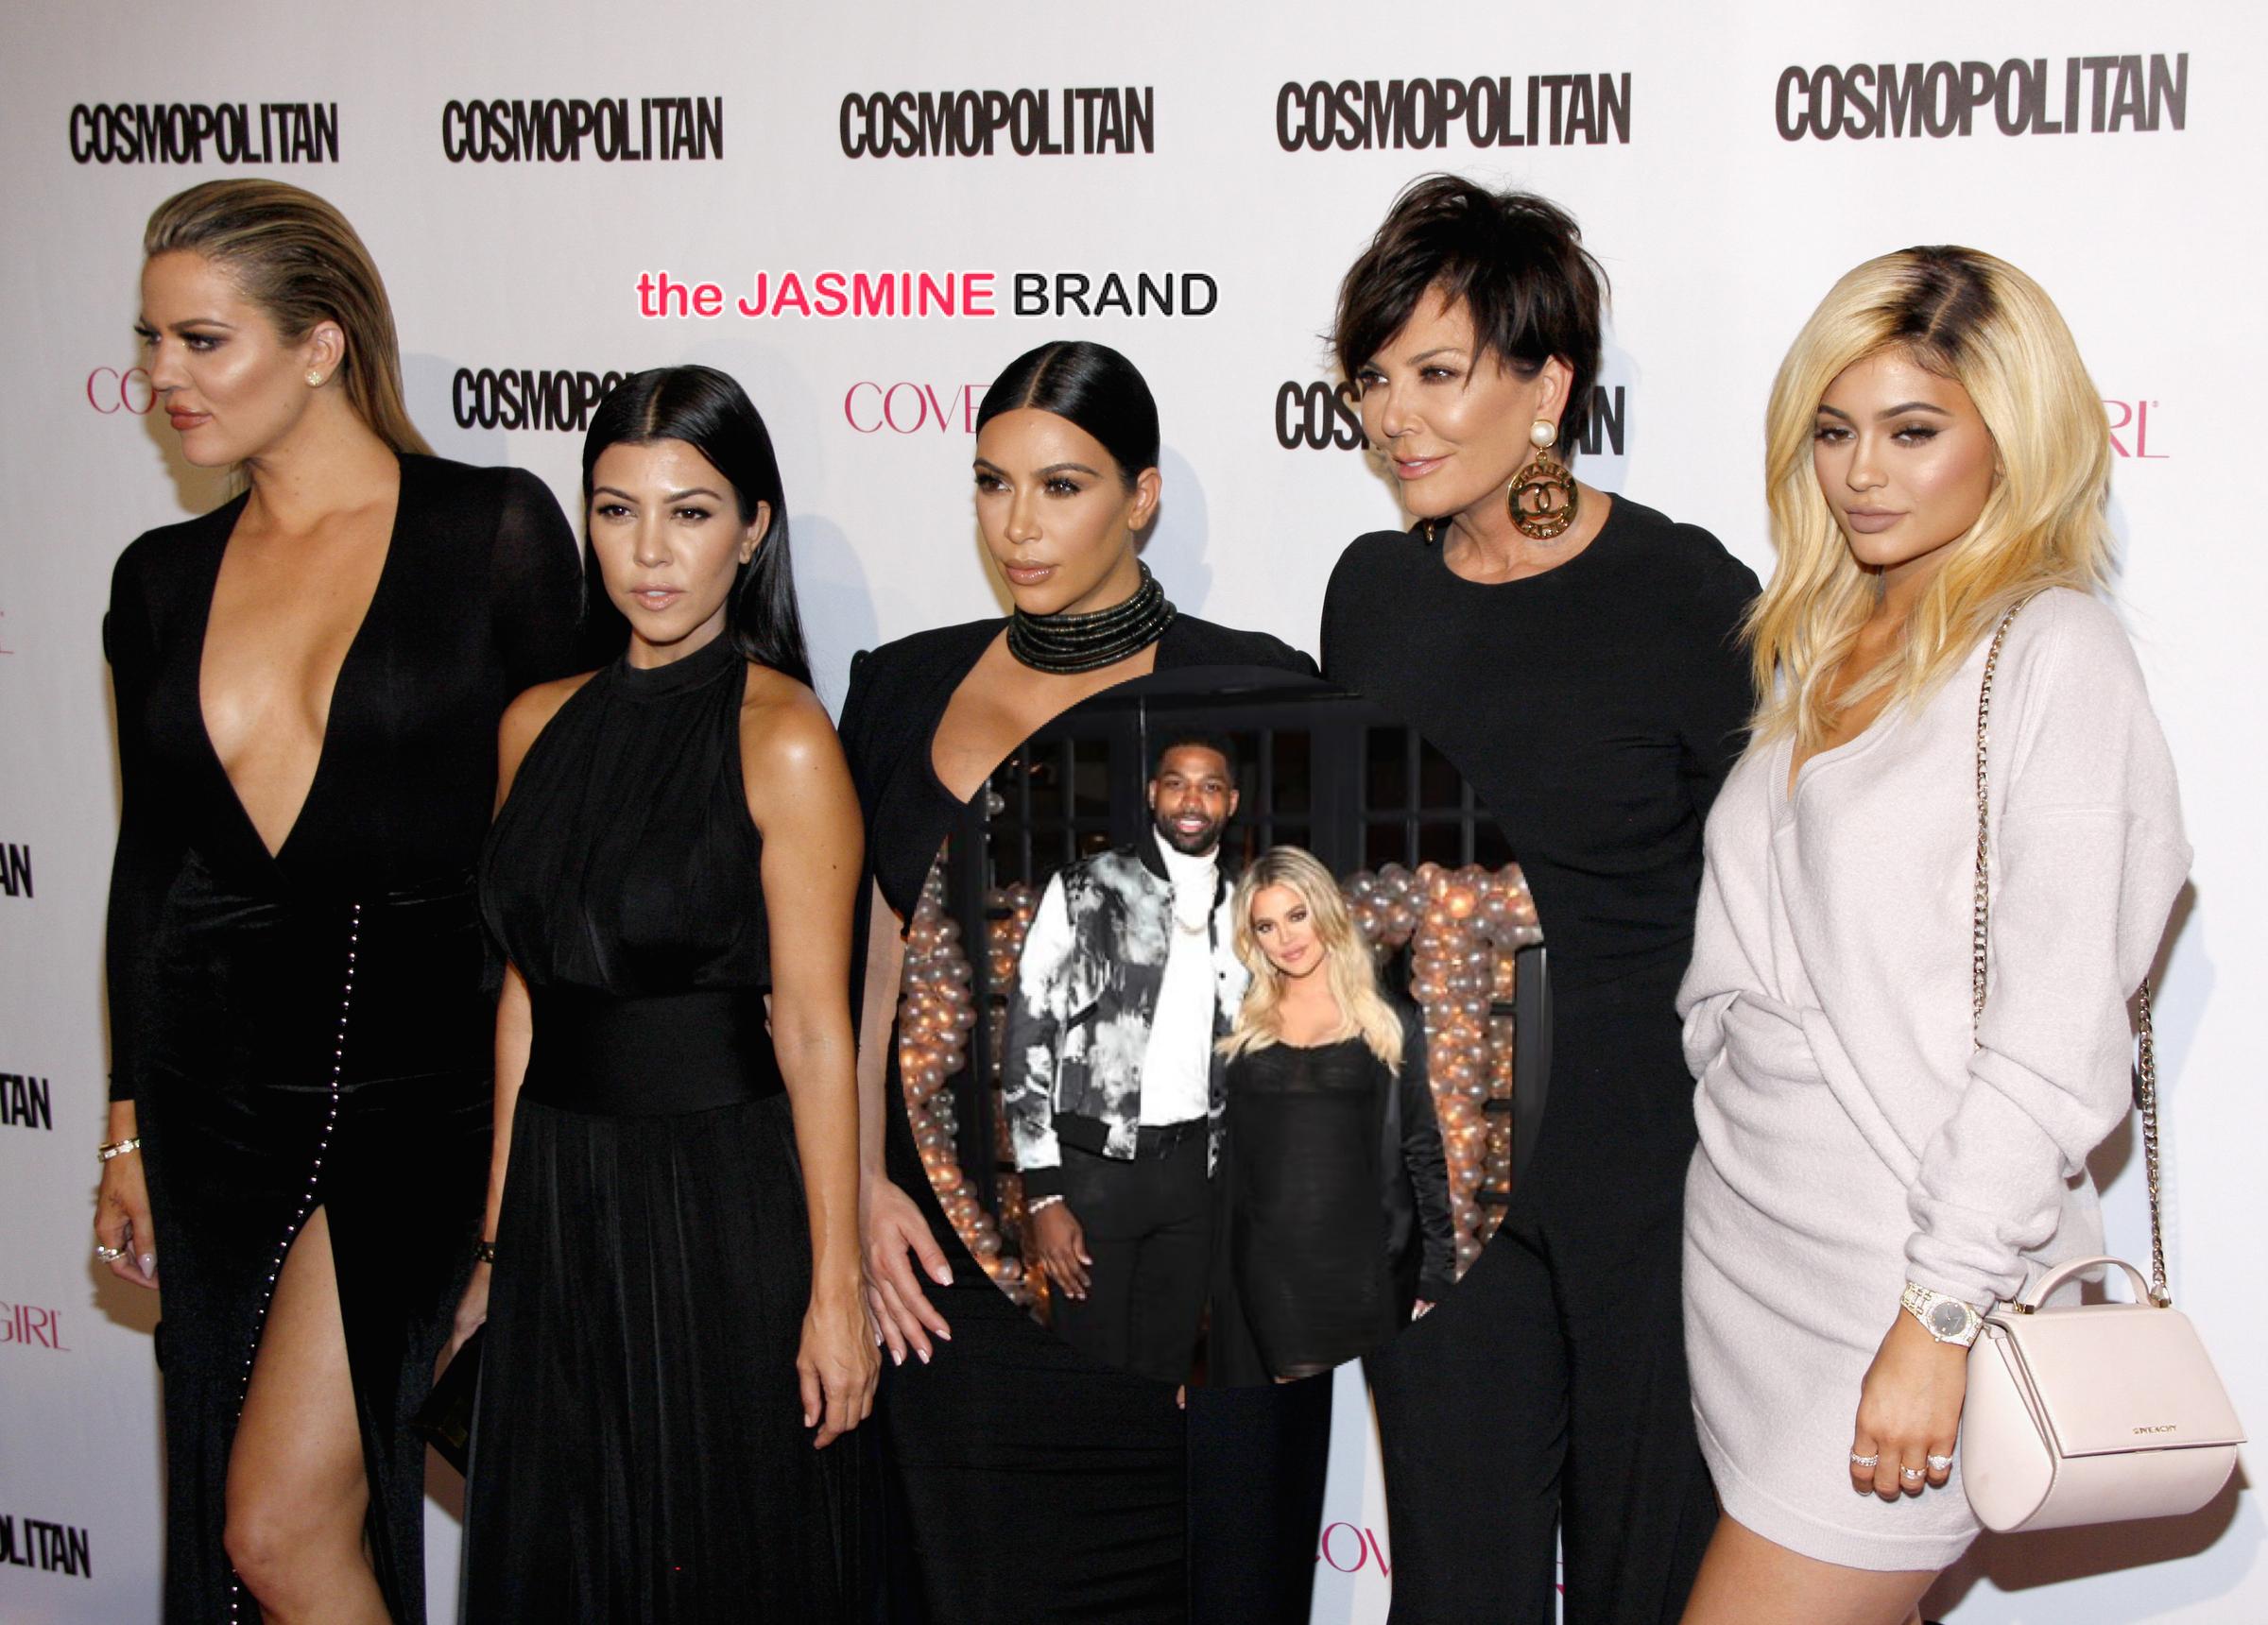 Khloé Kardashian Will Address Tristan Thompsons Cheating Scandal on KUWTK